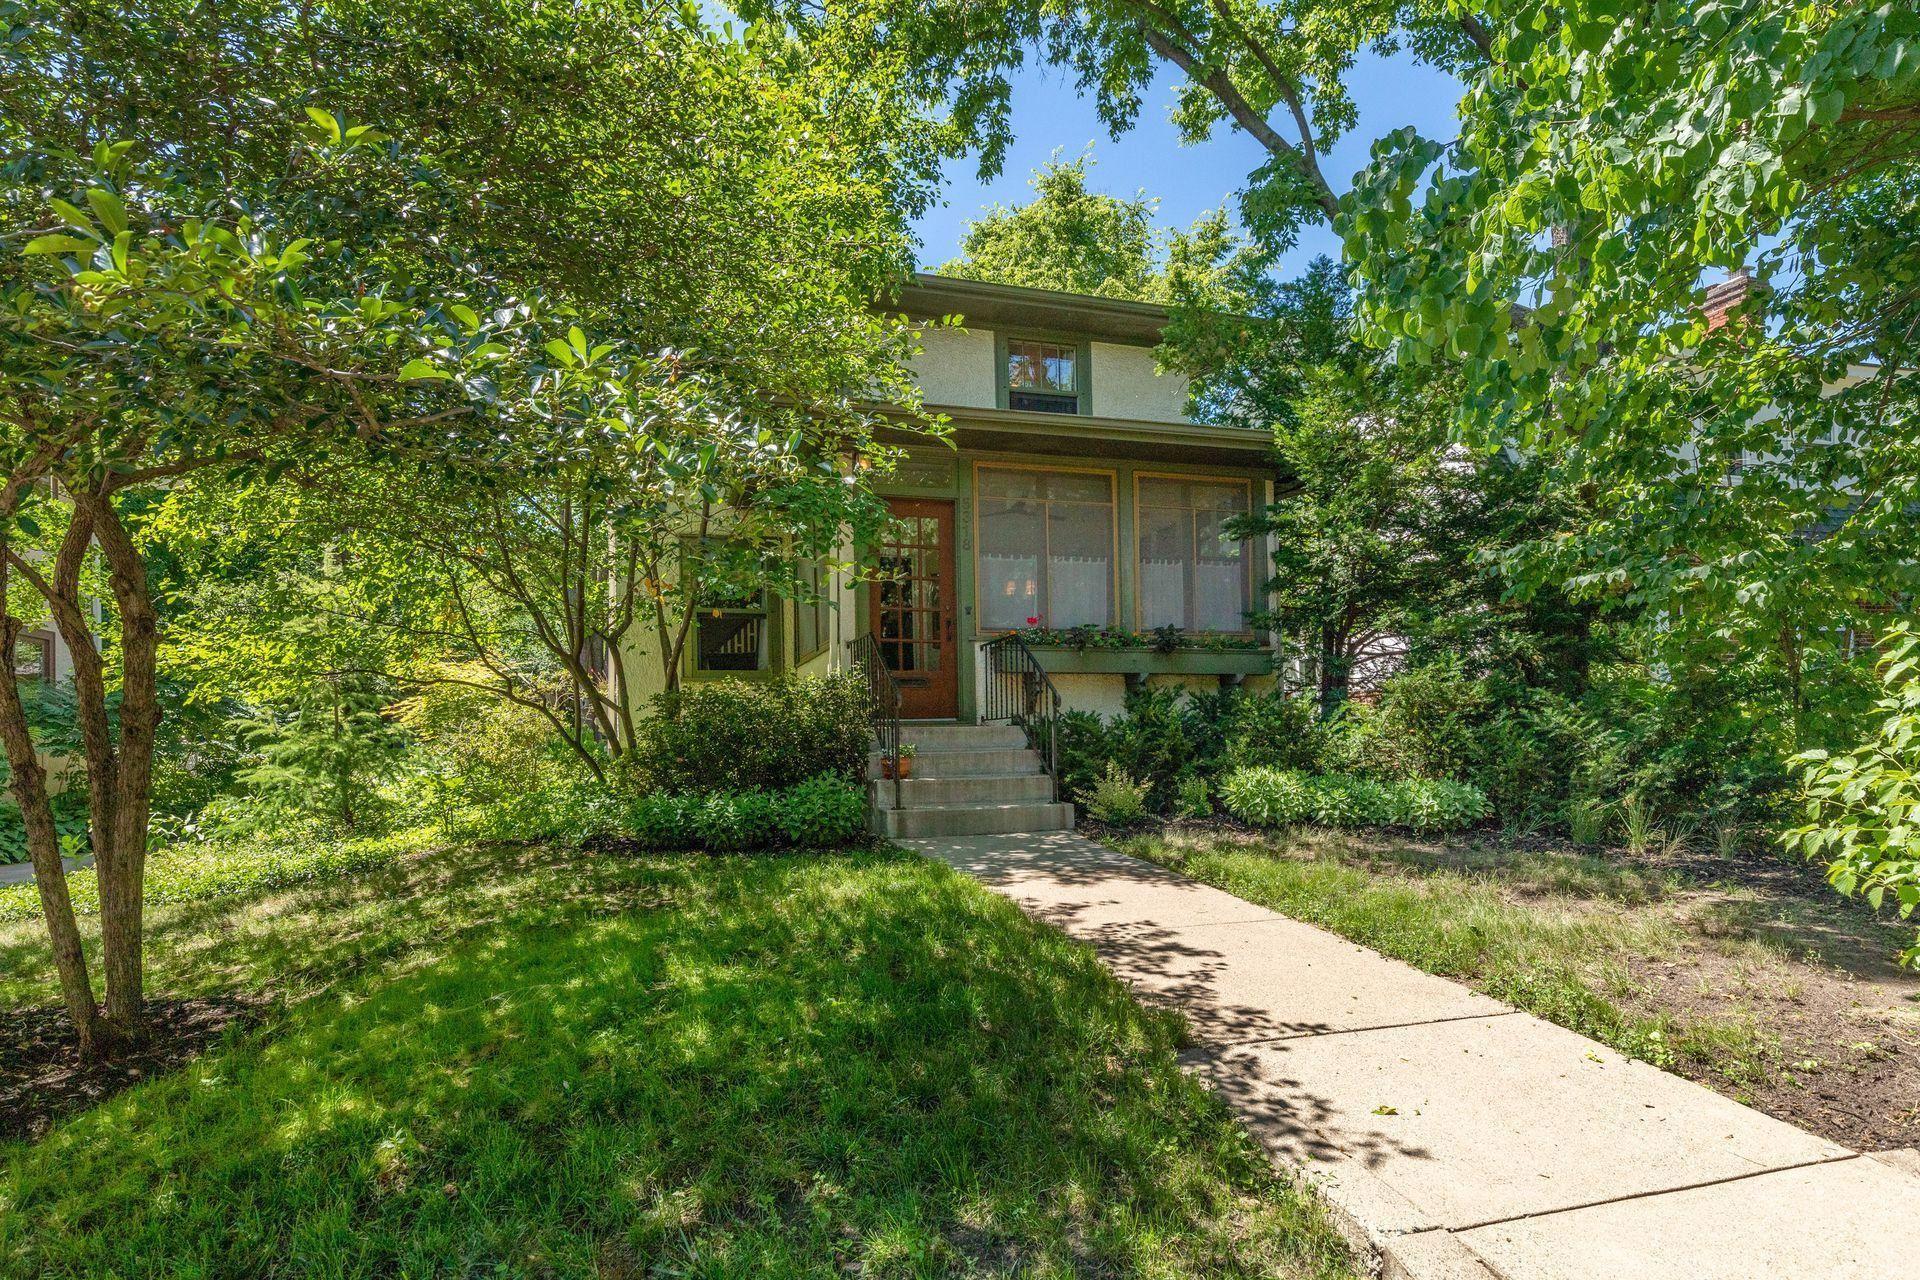 Photo of 5318 Pleasant Avenue S, Minneapolis, MN 55419 (MLS # 5755648)